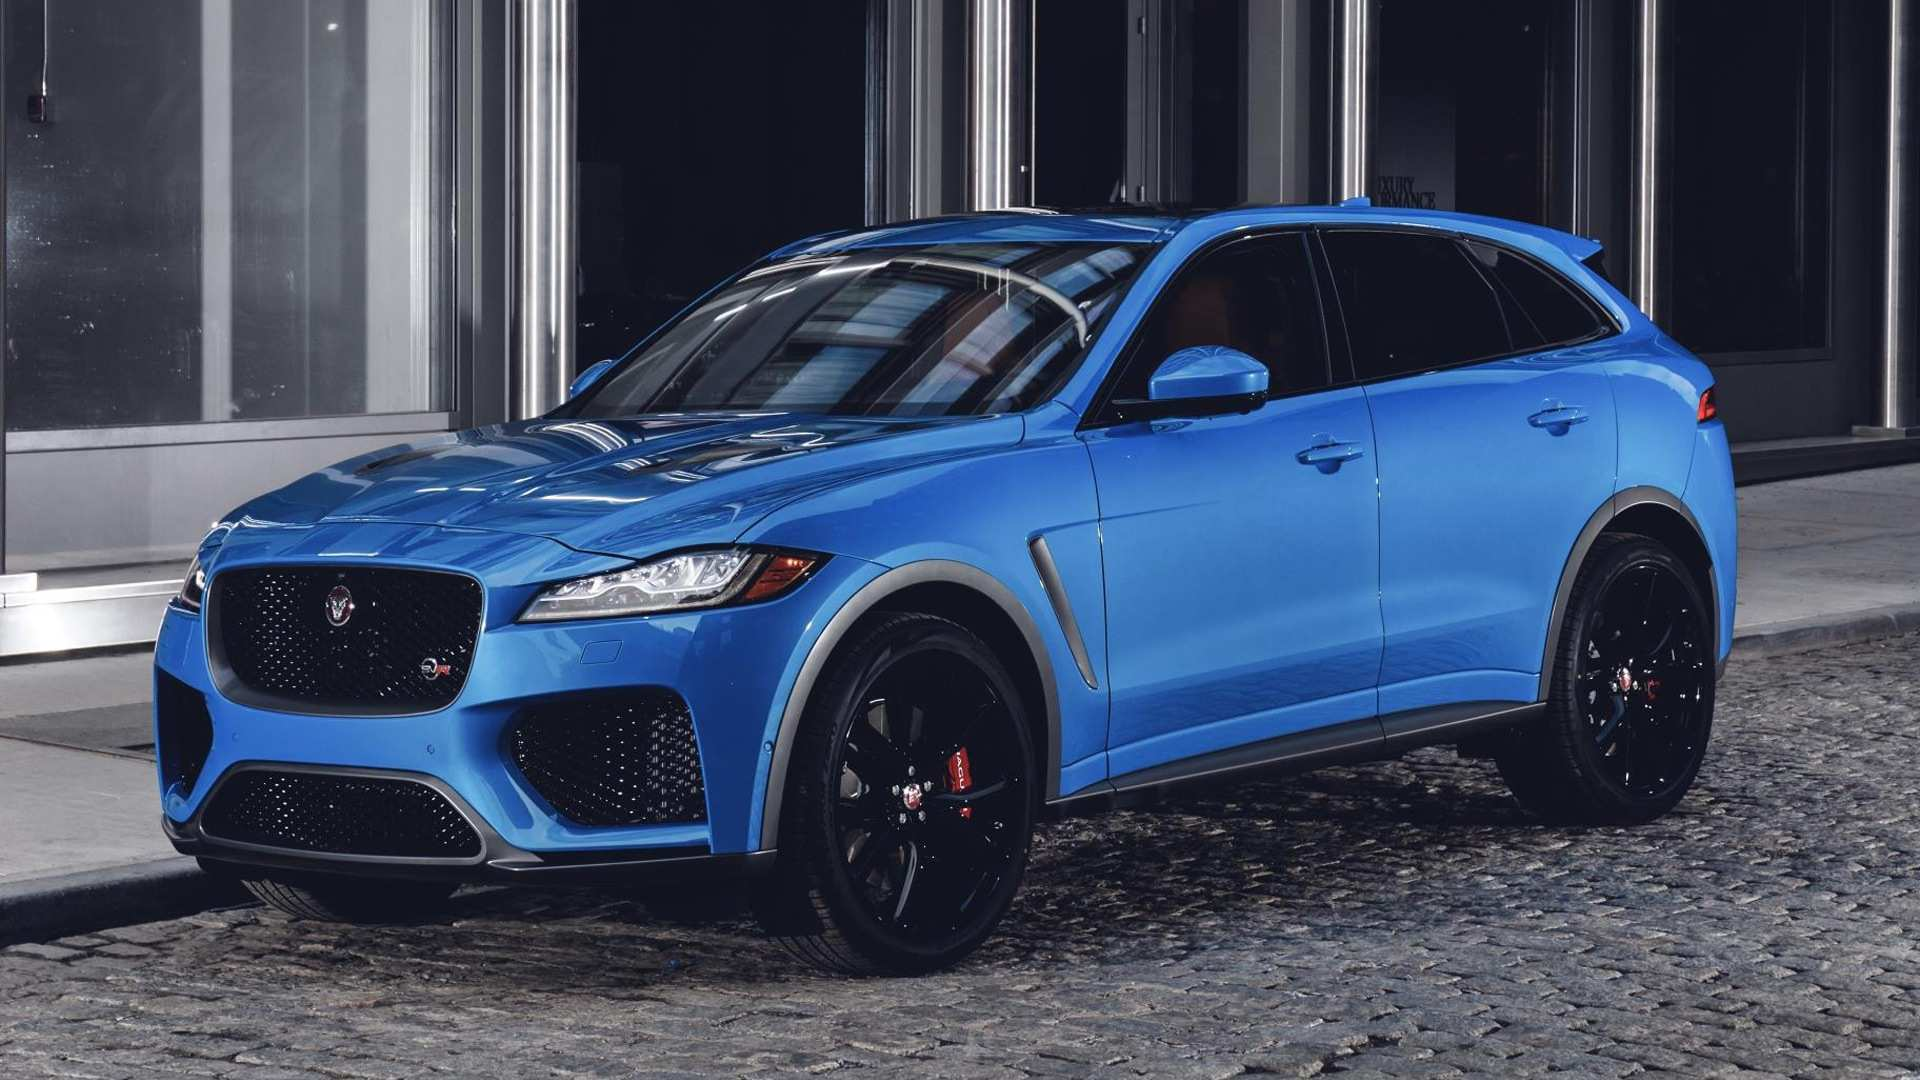 75 All New 2019 Jaguar Pace Rumors for 2019 Jaguar Pace